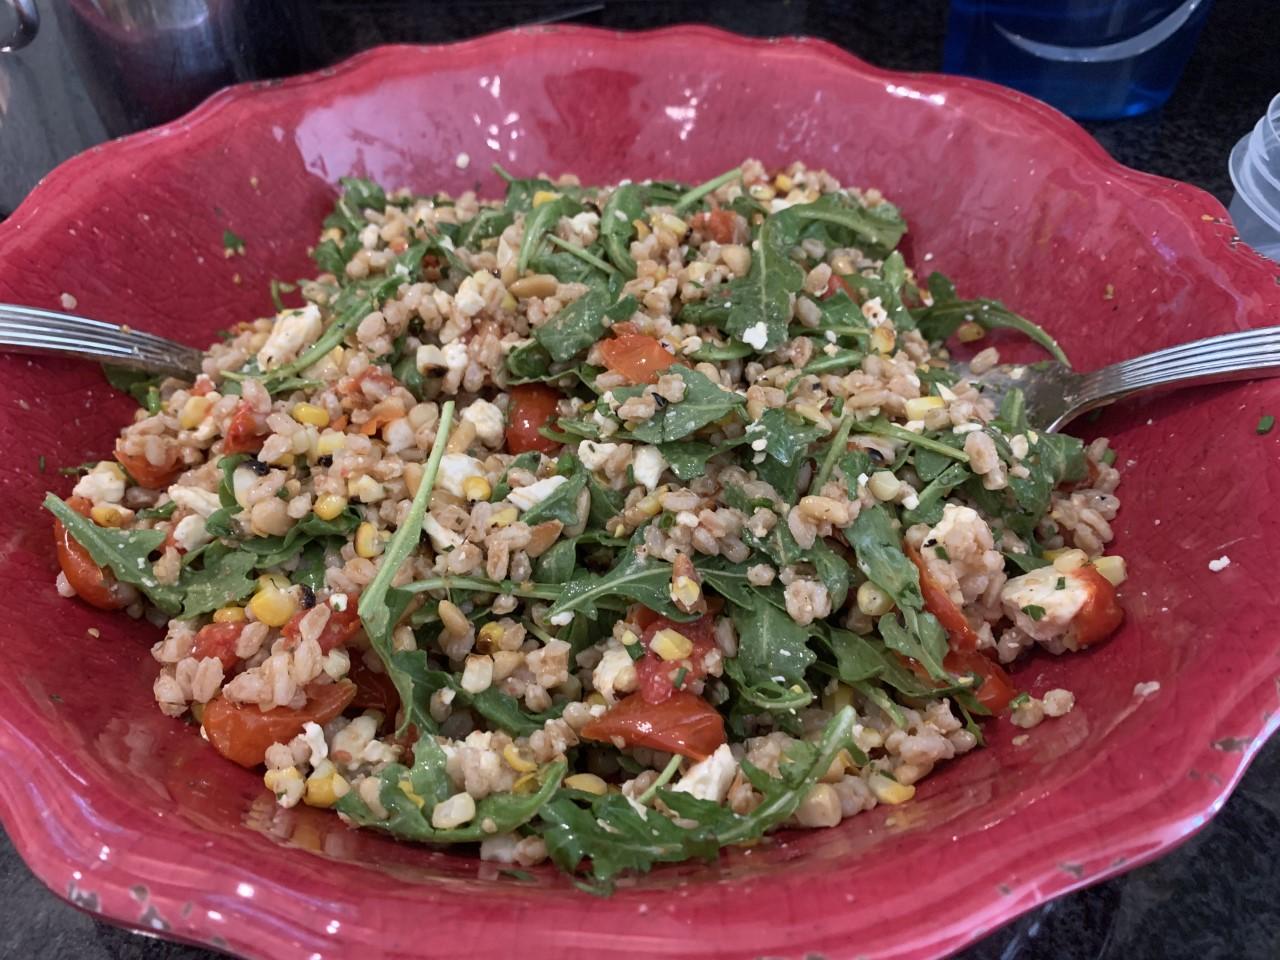 Farro Salad with Corn, Tomatoes, Feta, Arugula, and Pine Nuts